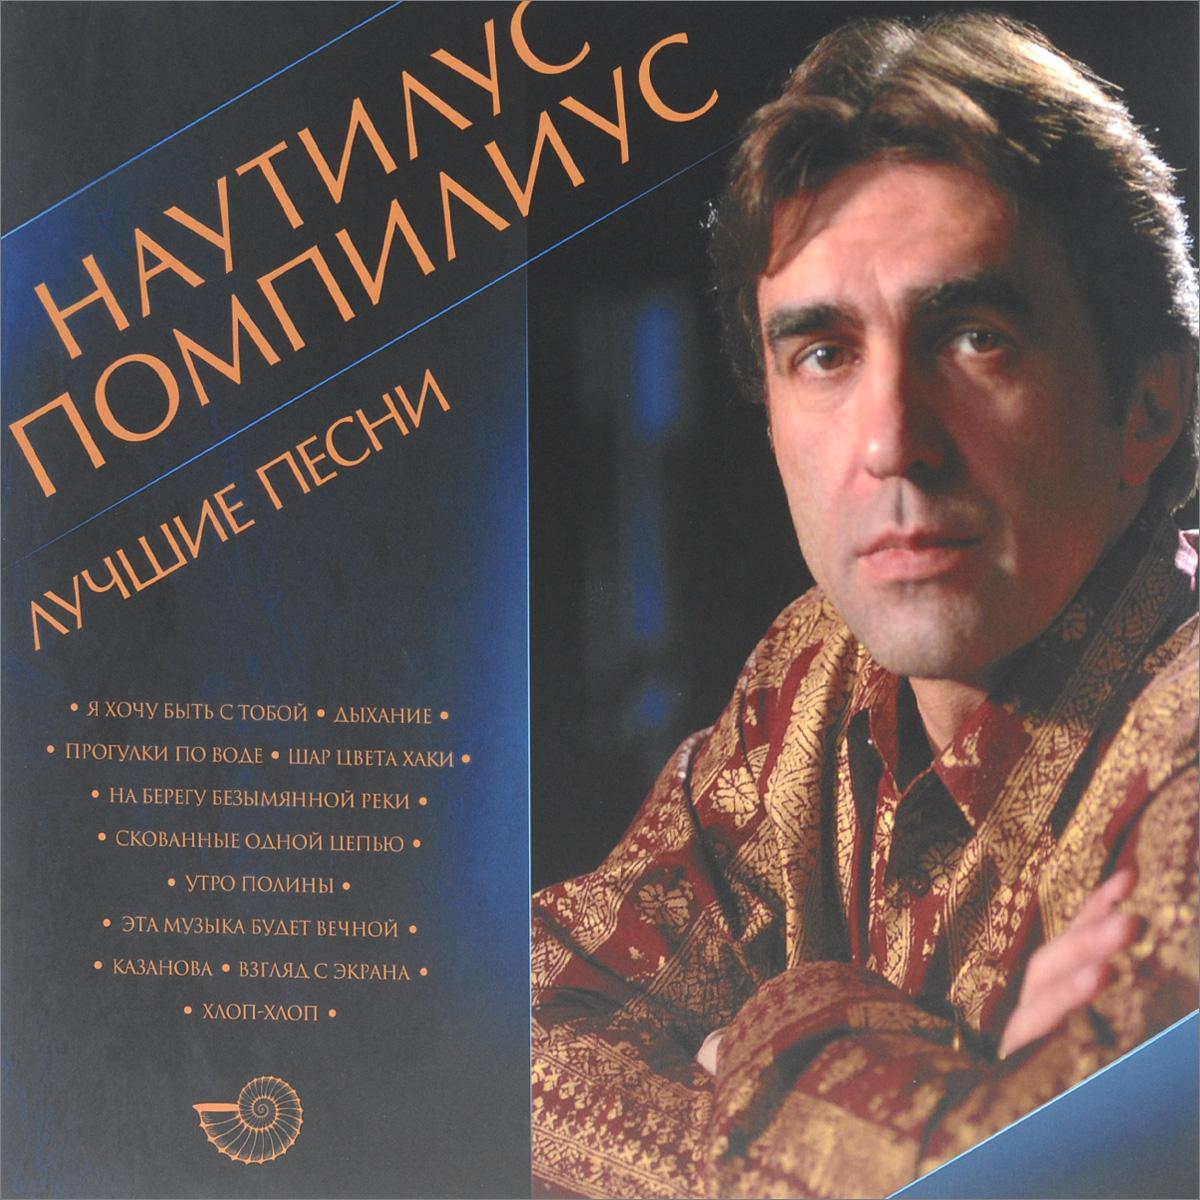 LP 1:Tracks 1 - 6LP 2:Tracks 7 - 11